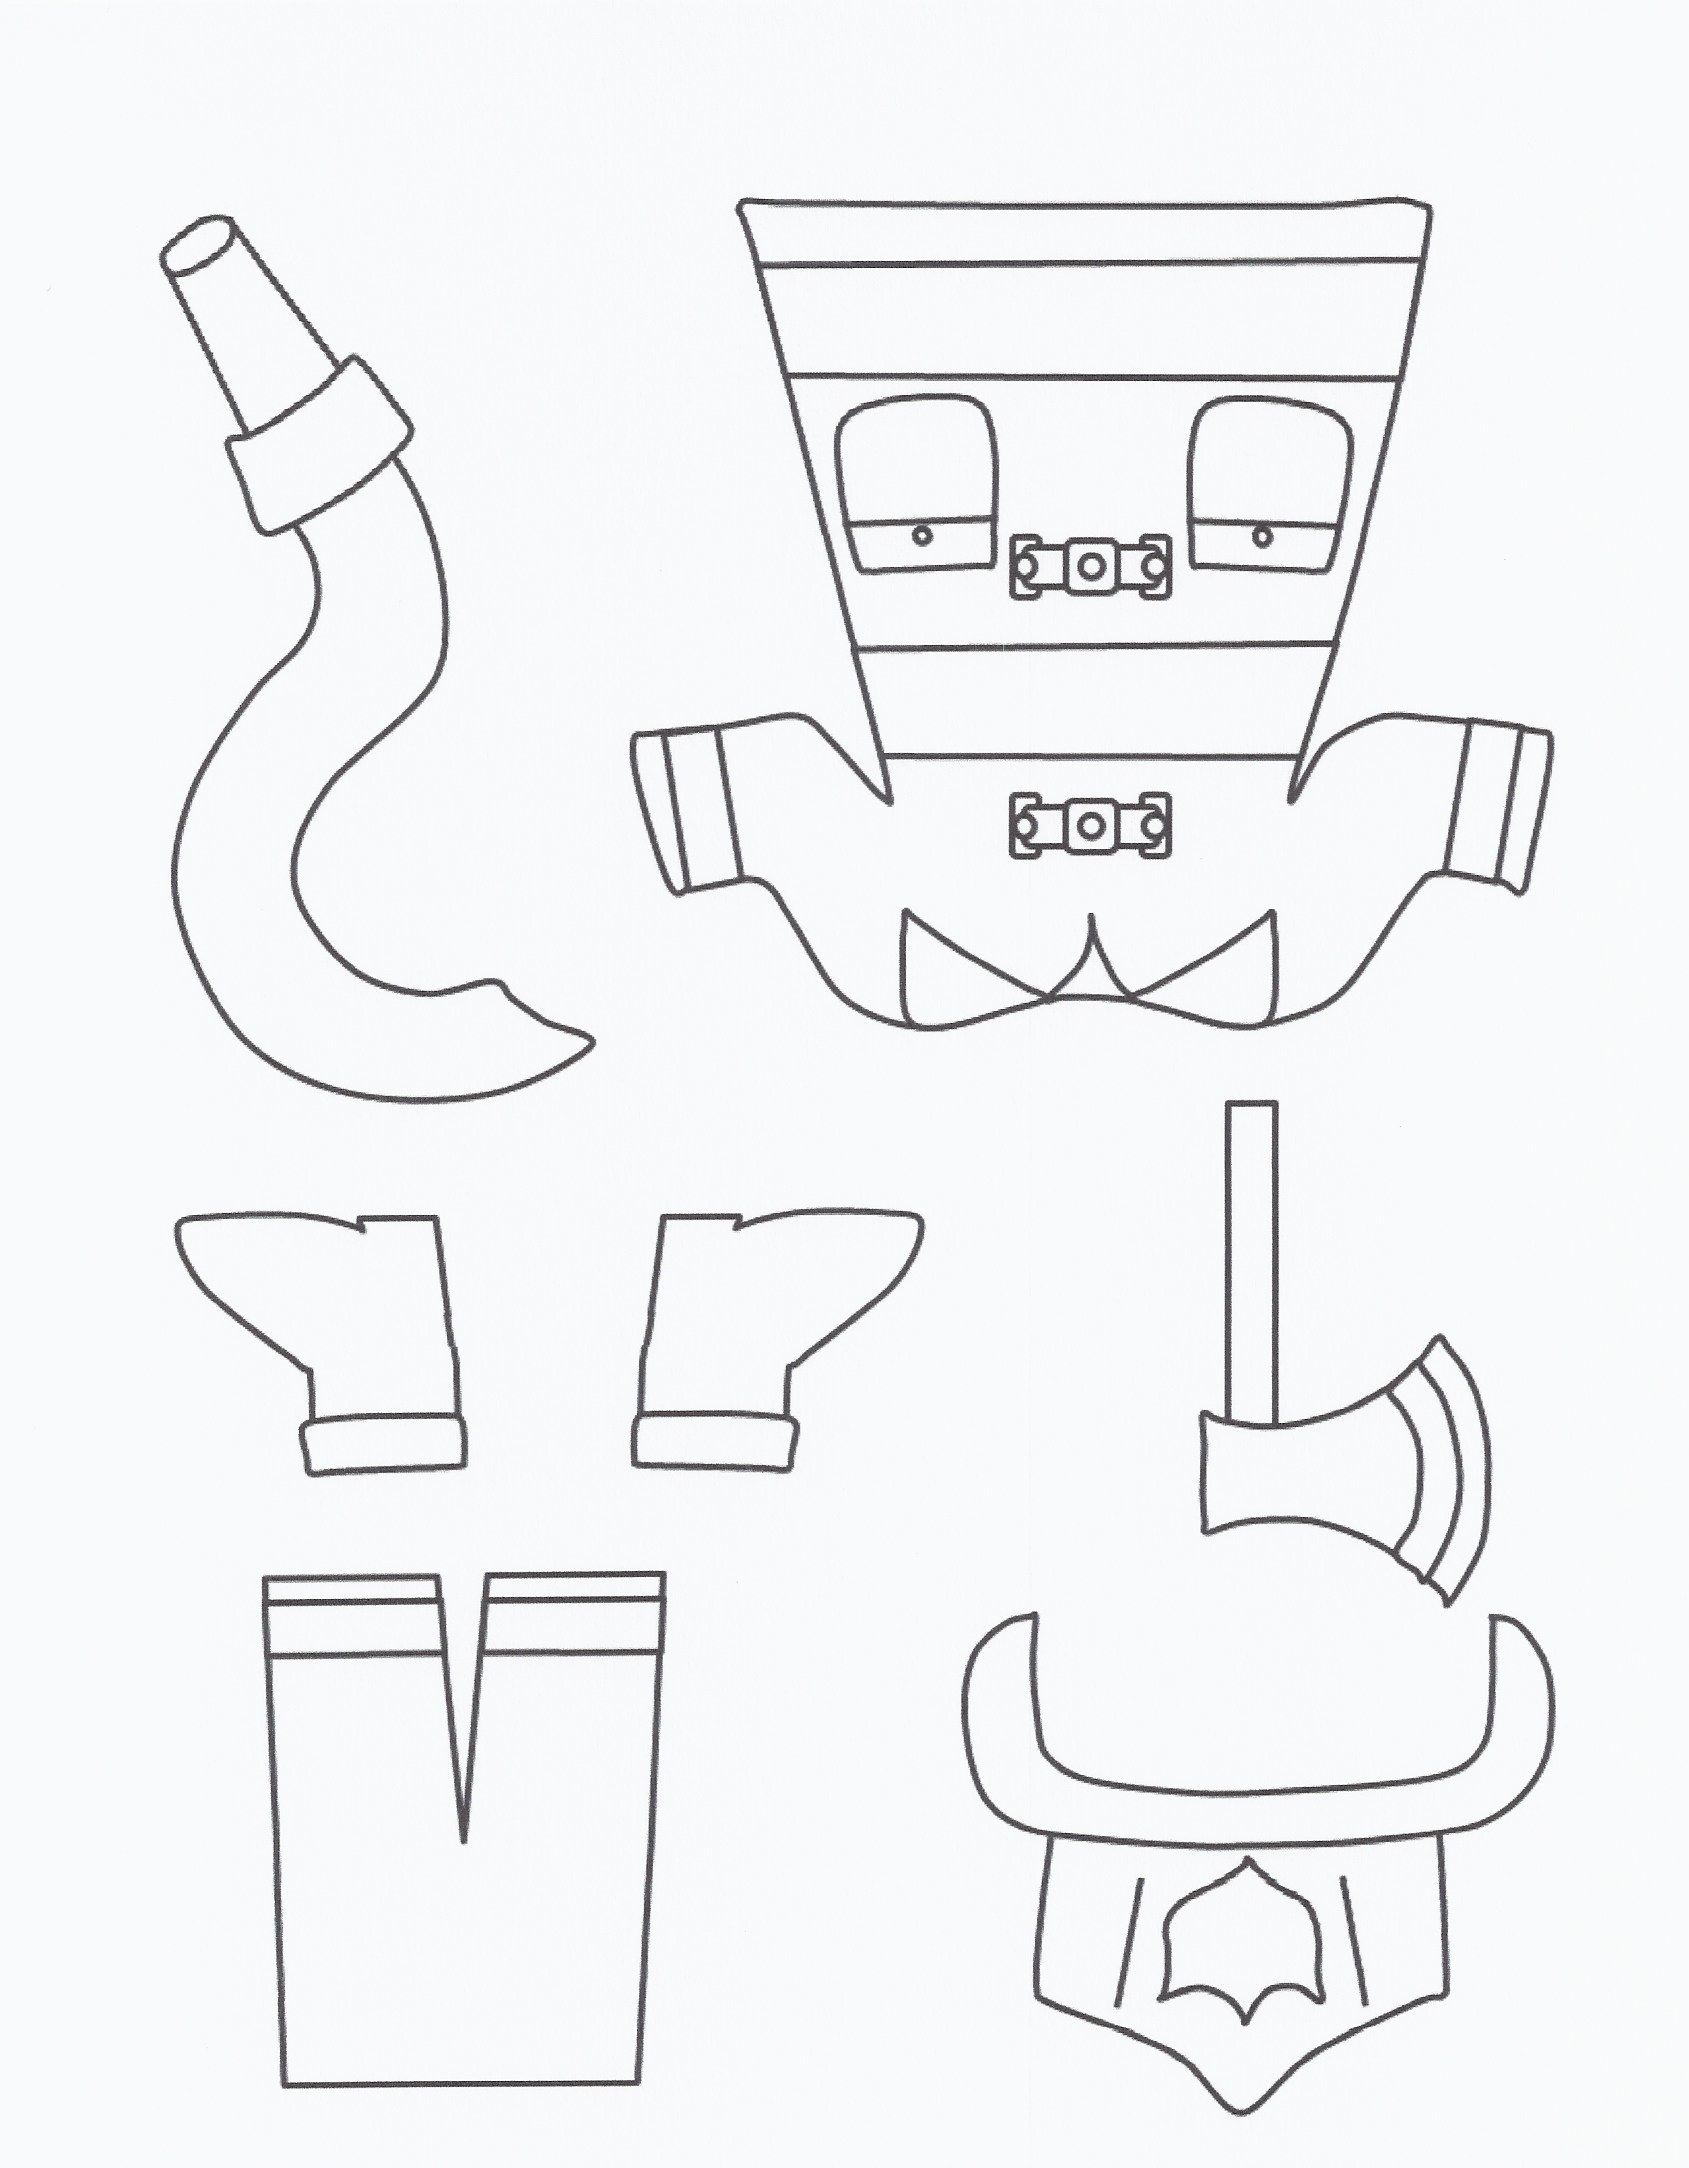 notifier control module wiring diagram